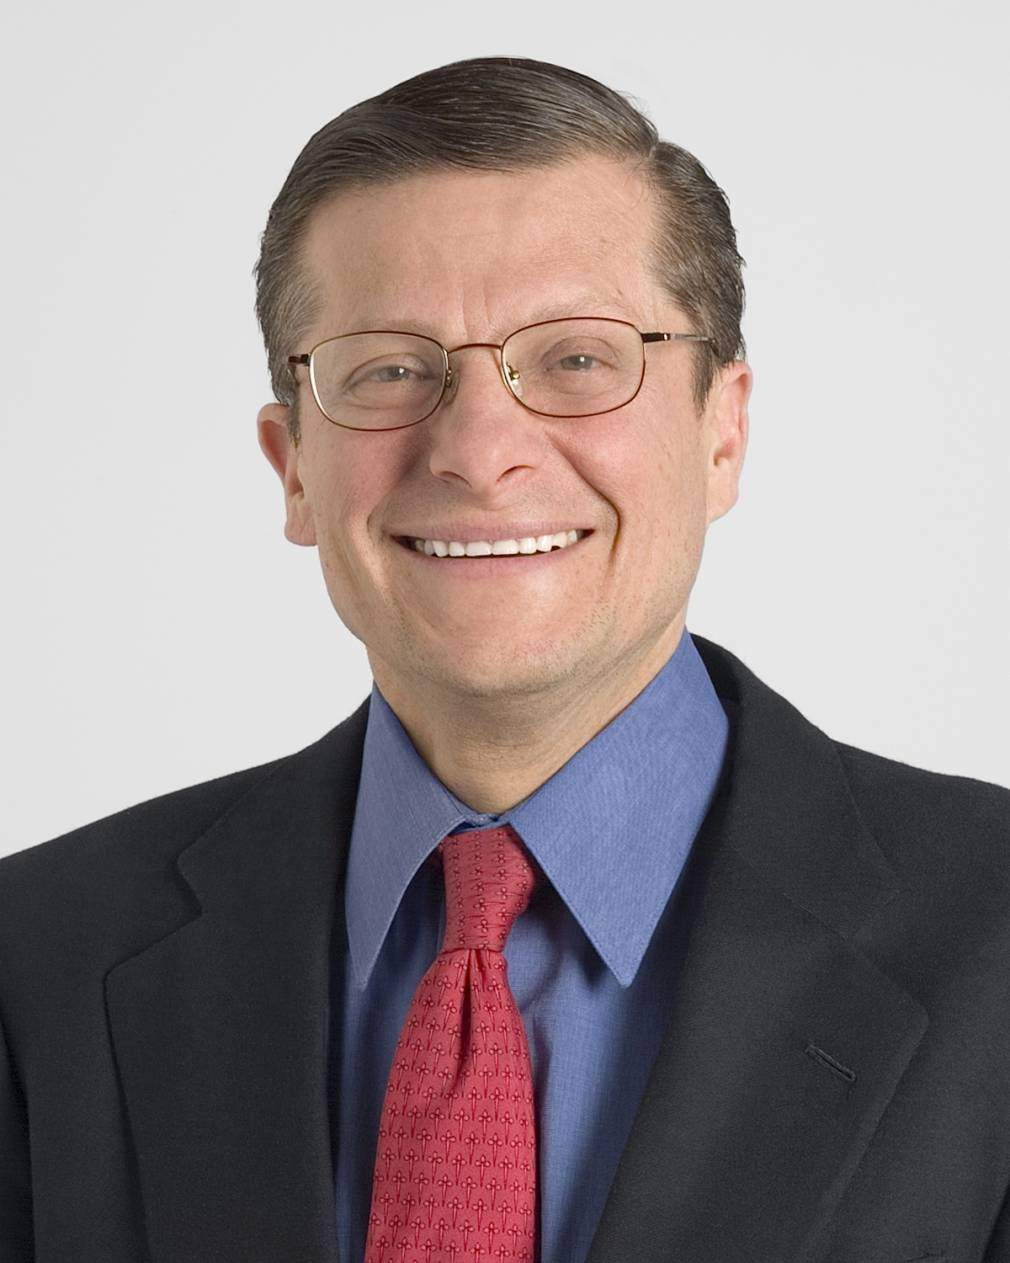 Michael-Roizen-speaker